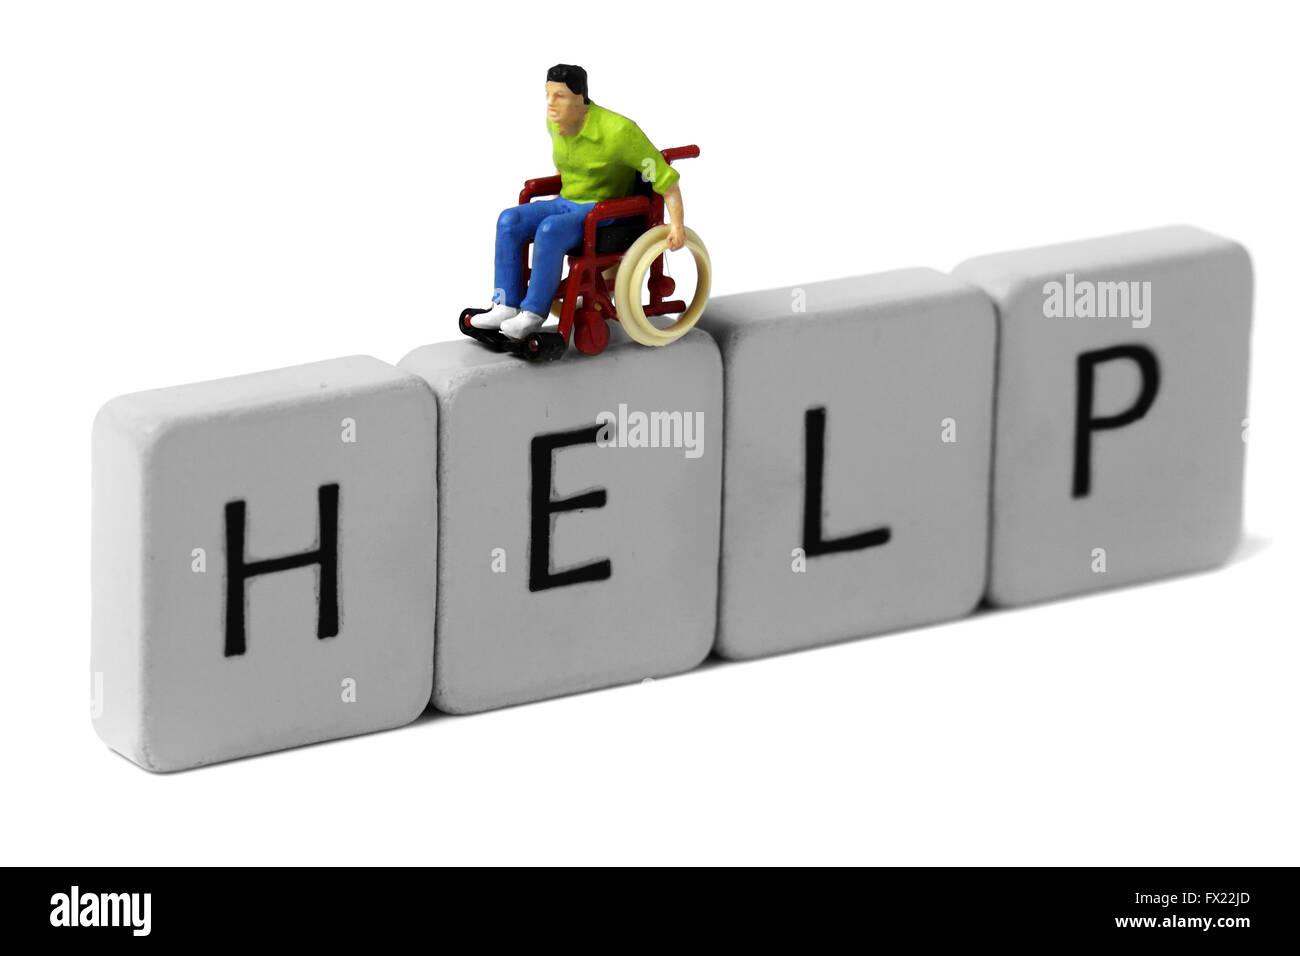 Miniature model man wheelchair help - Stock Image